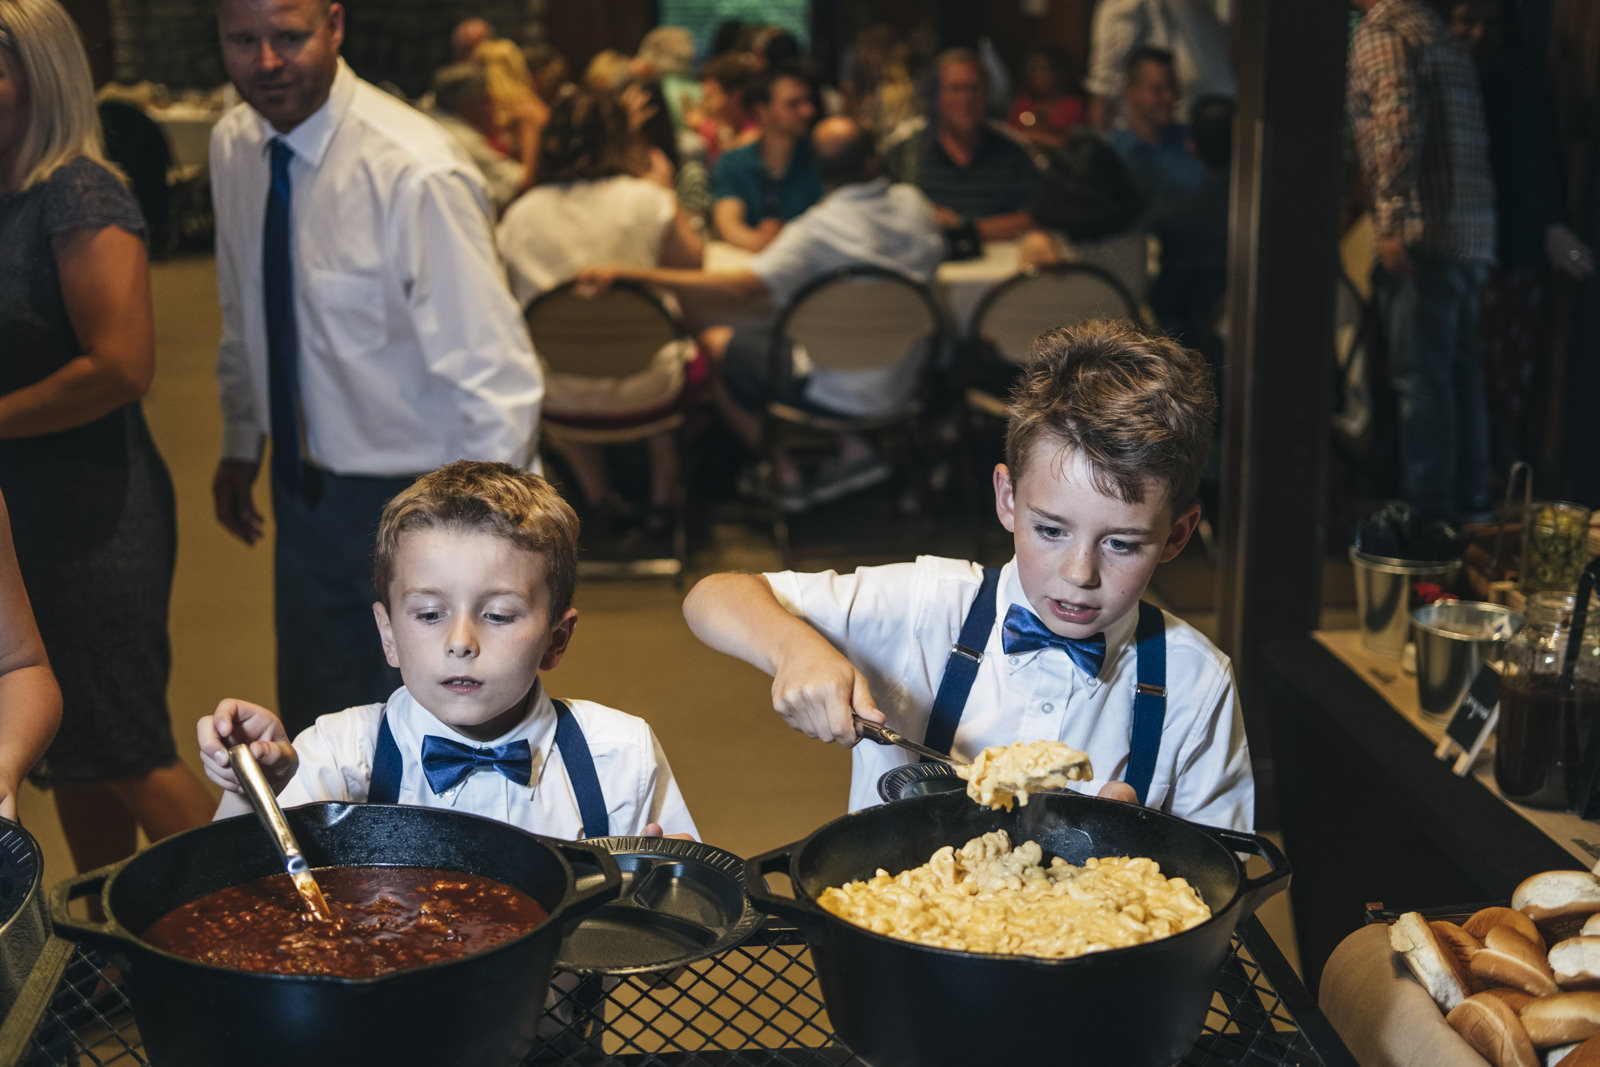 Boys eat during wedding reception in Ohio.